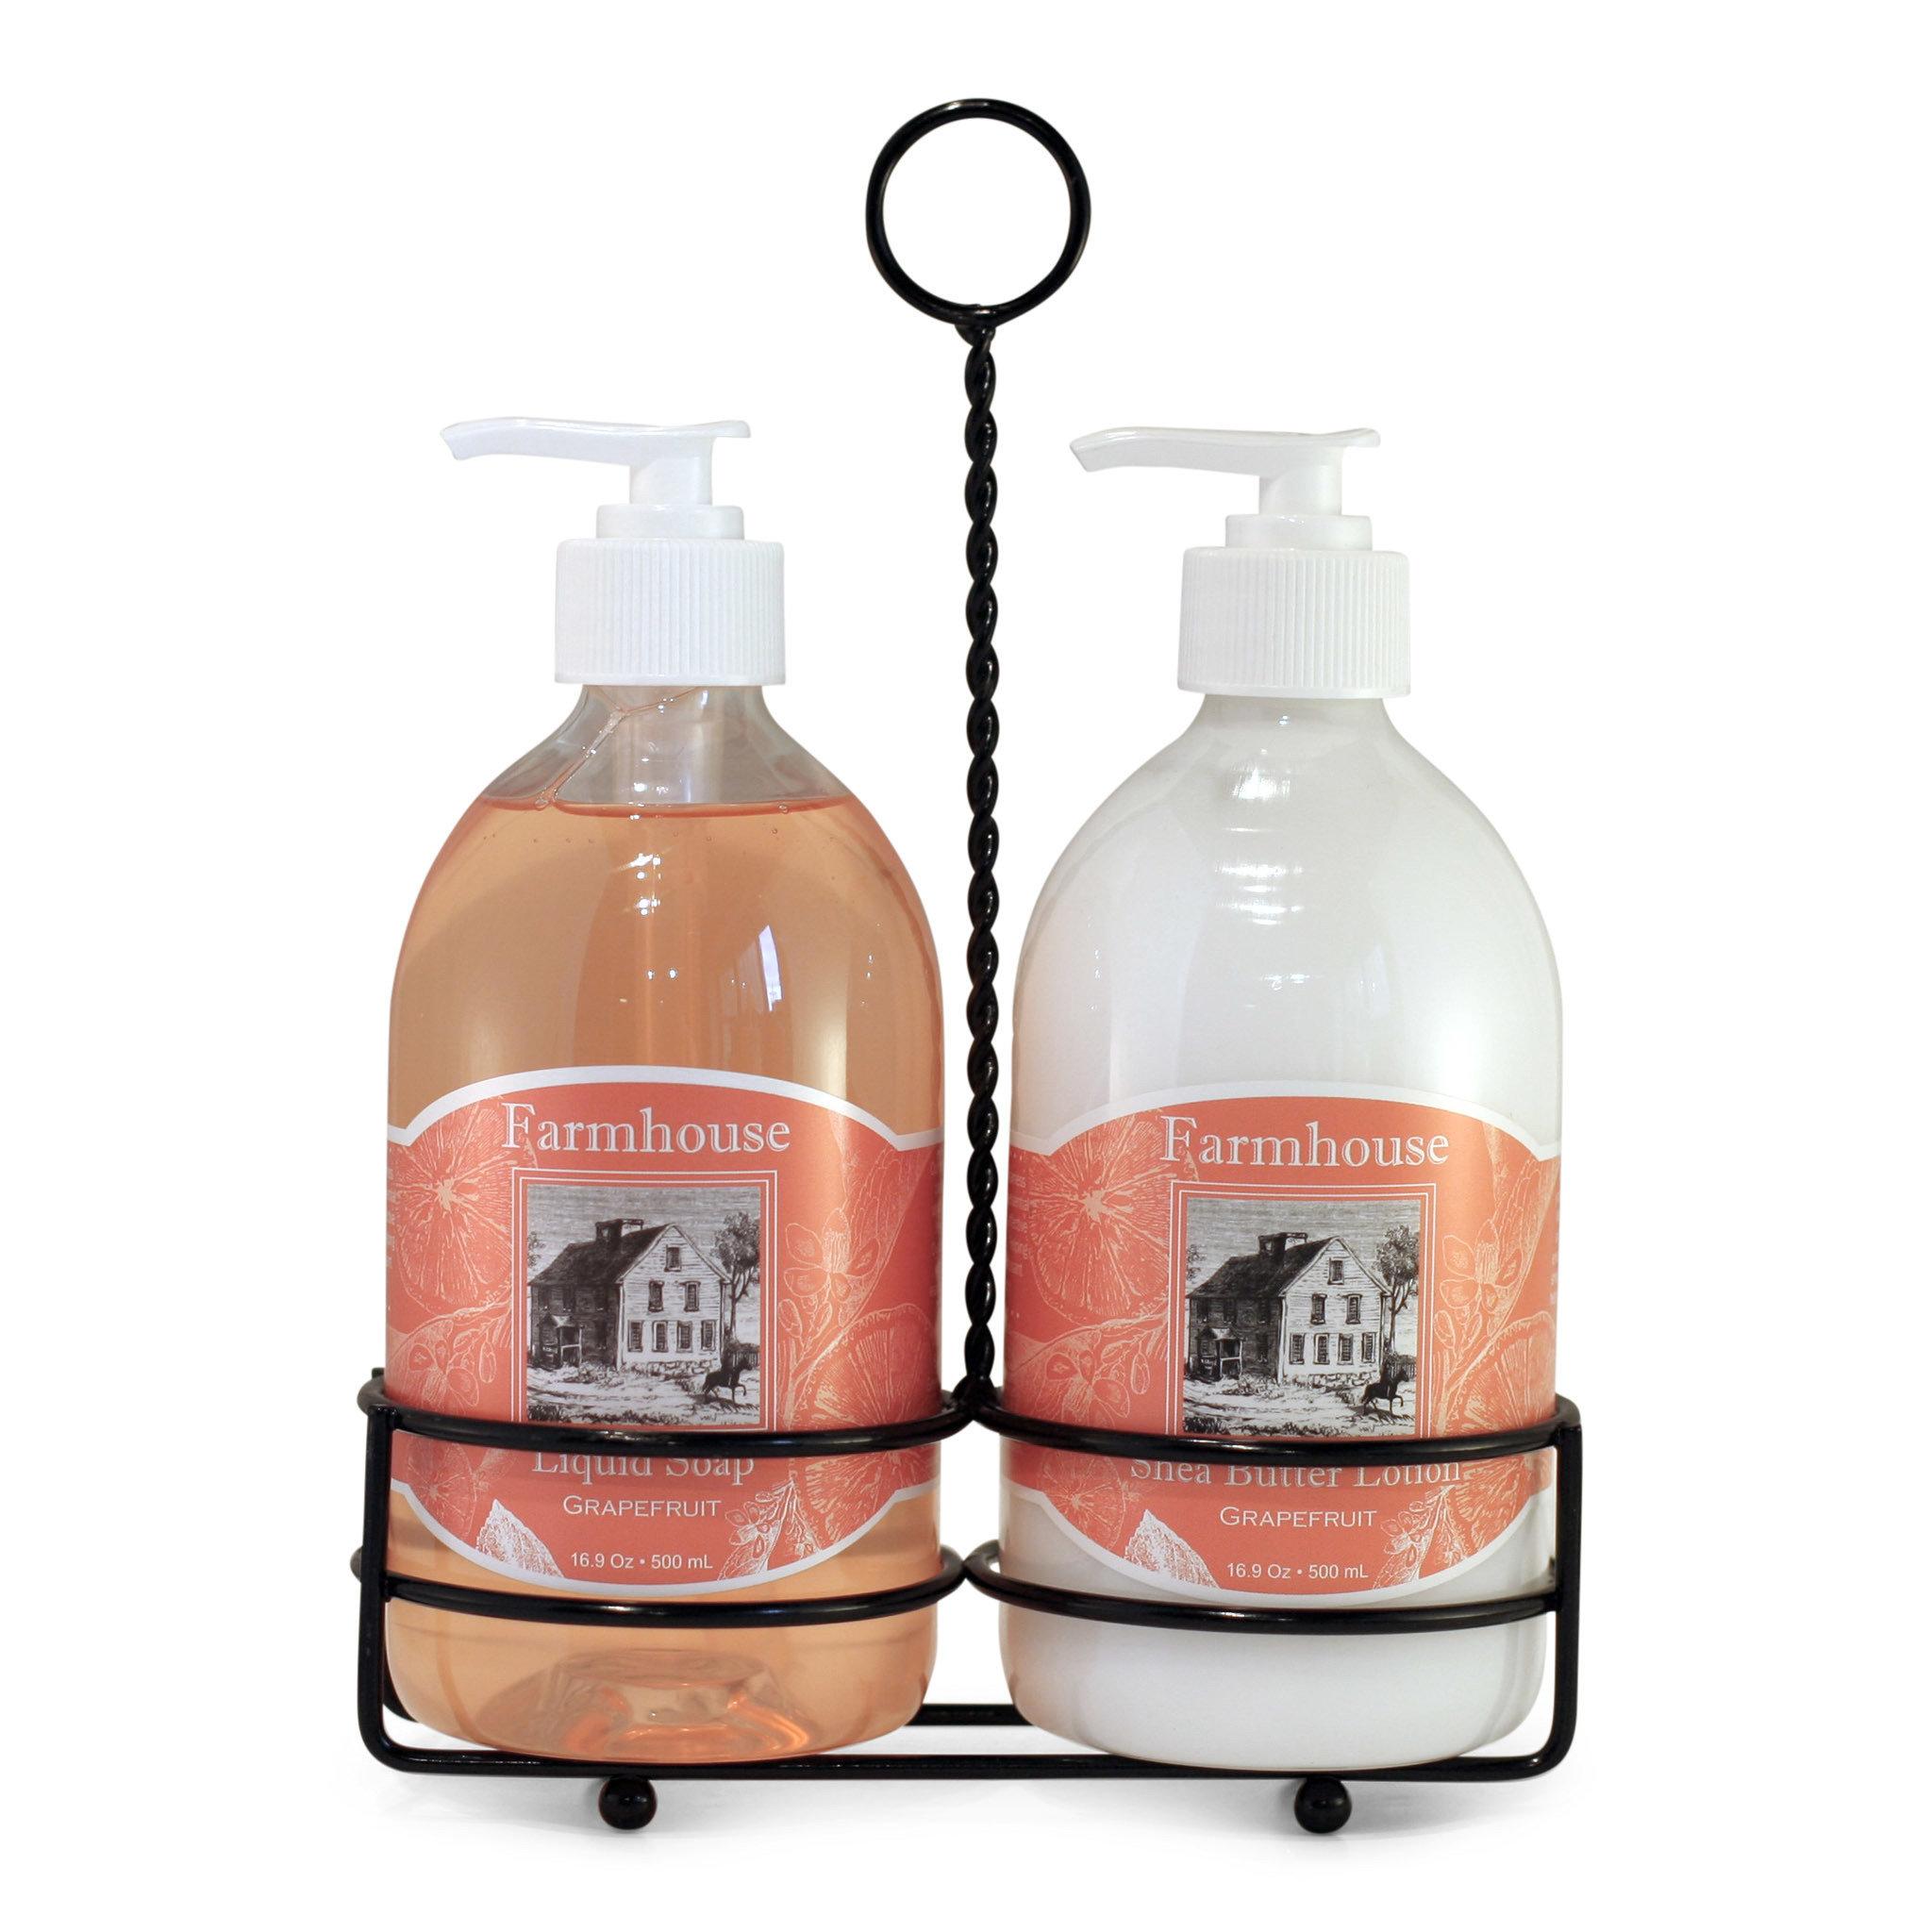 Farmhouse Grapefruit Lotion And Soap Set NA1W1HZ8R8XBA